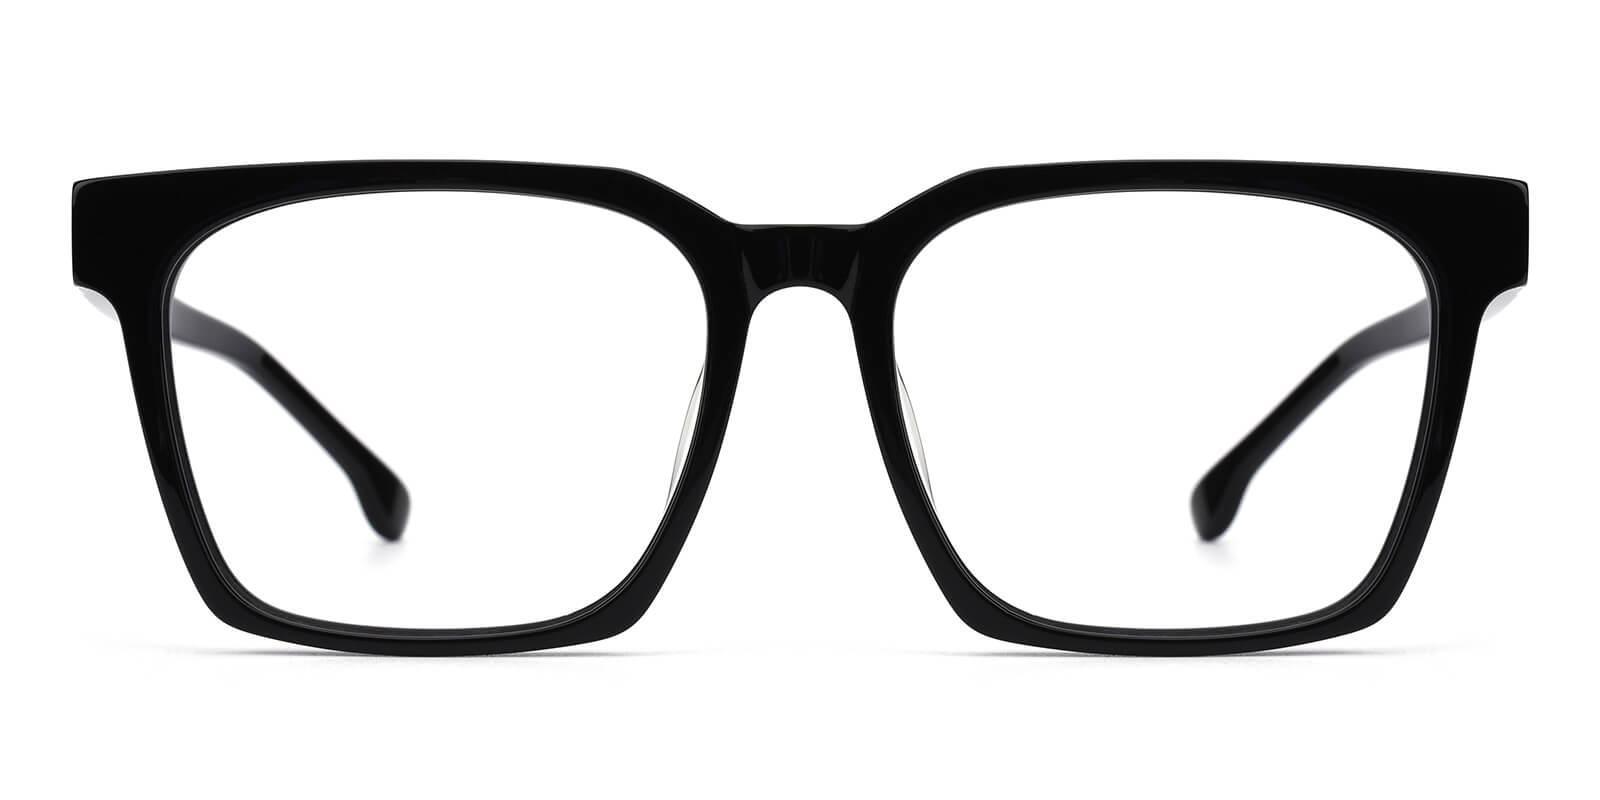 Trapezoid-Black-Square-Acetate-Eyeglasses-additional2